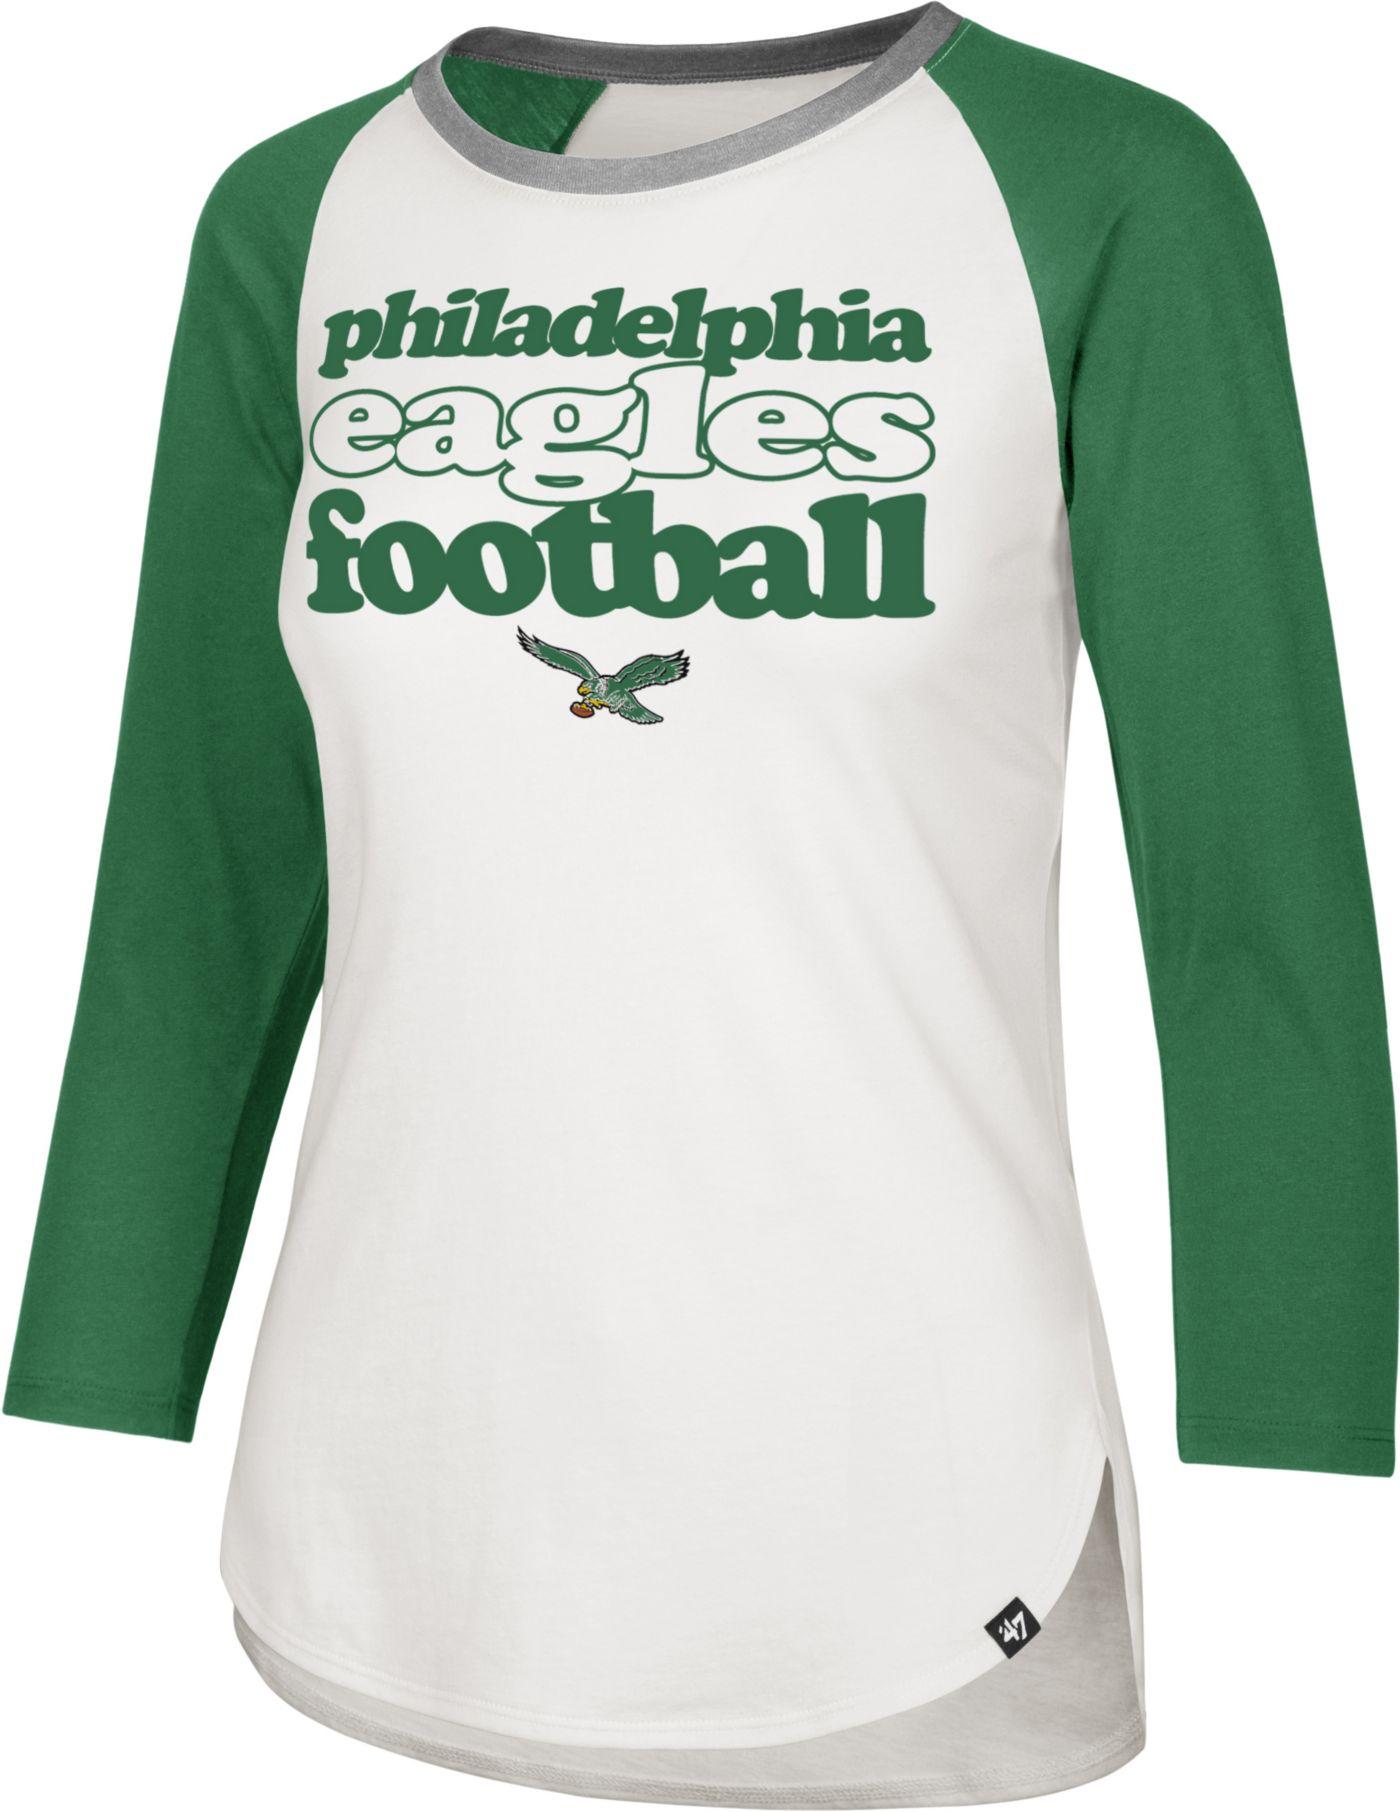 '47 Women's Philadelphia Eagles Retro Stock Throwback Raglan Shirt